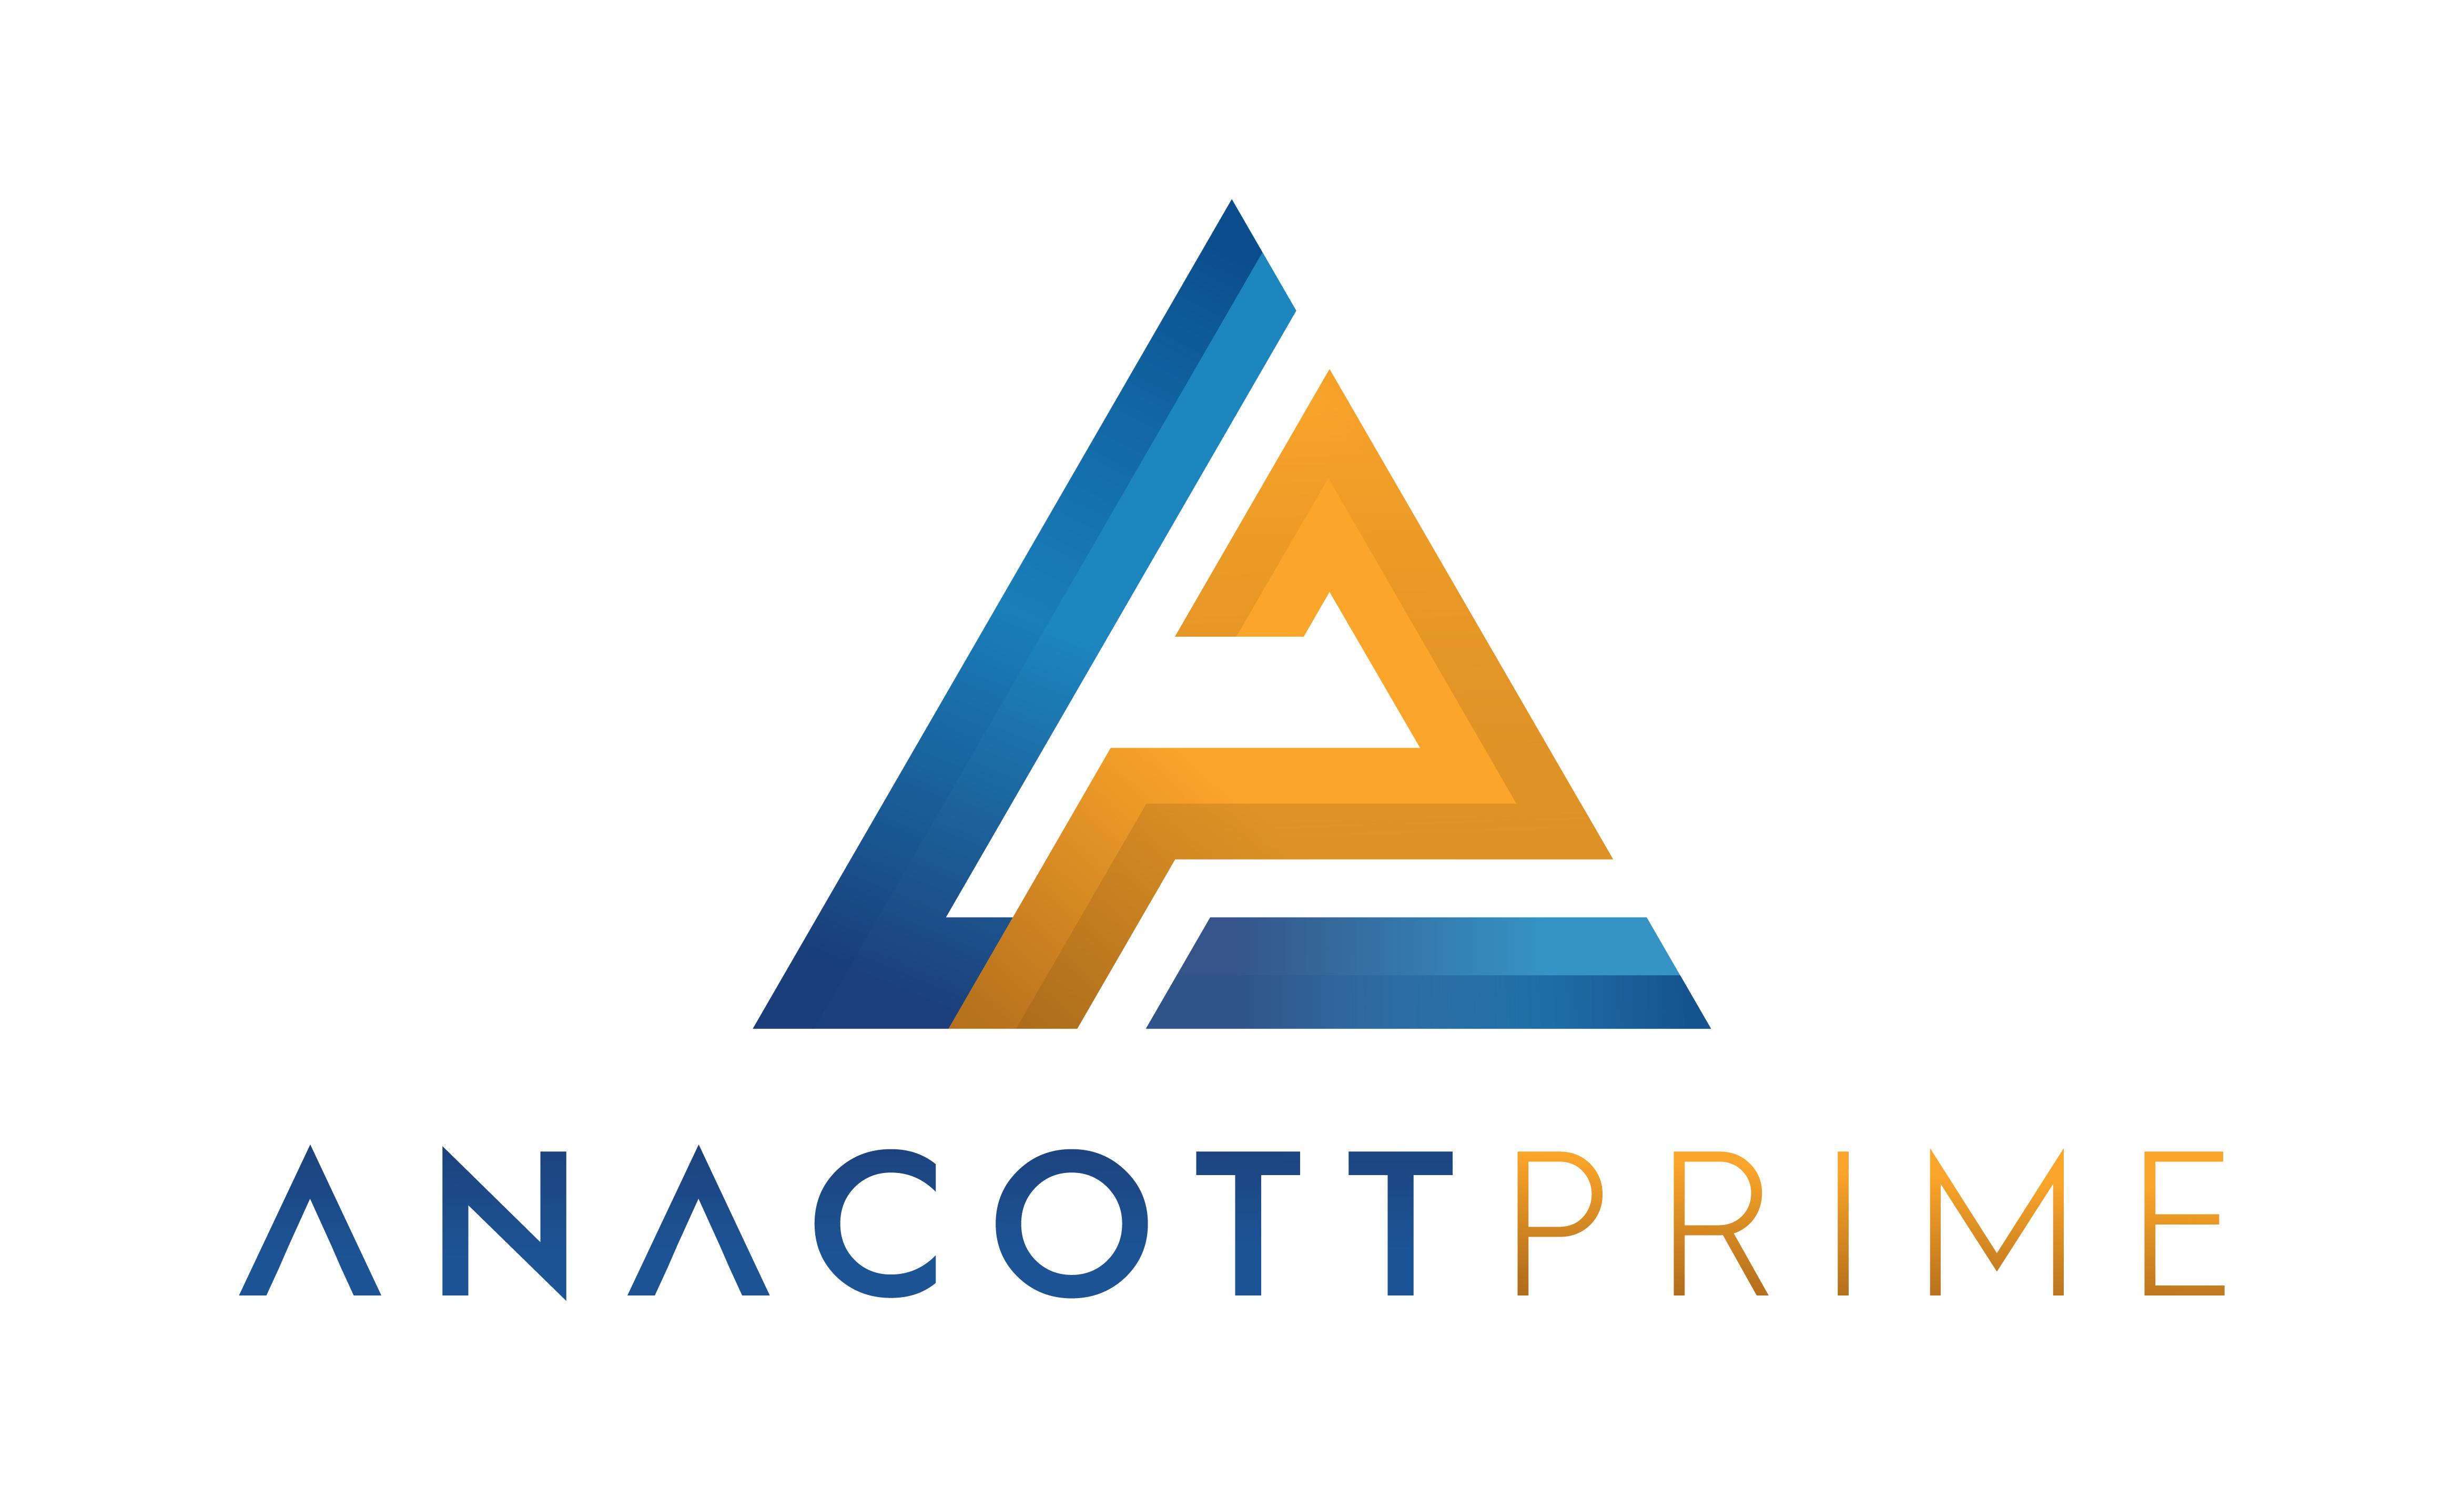 Anacott Prime Inc